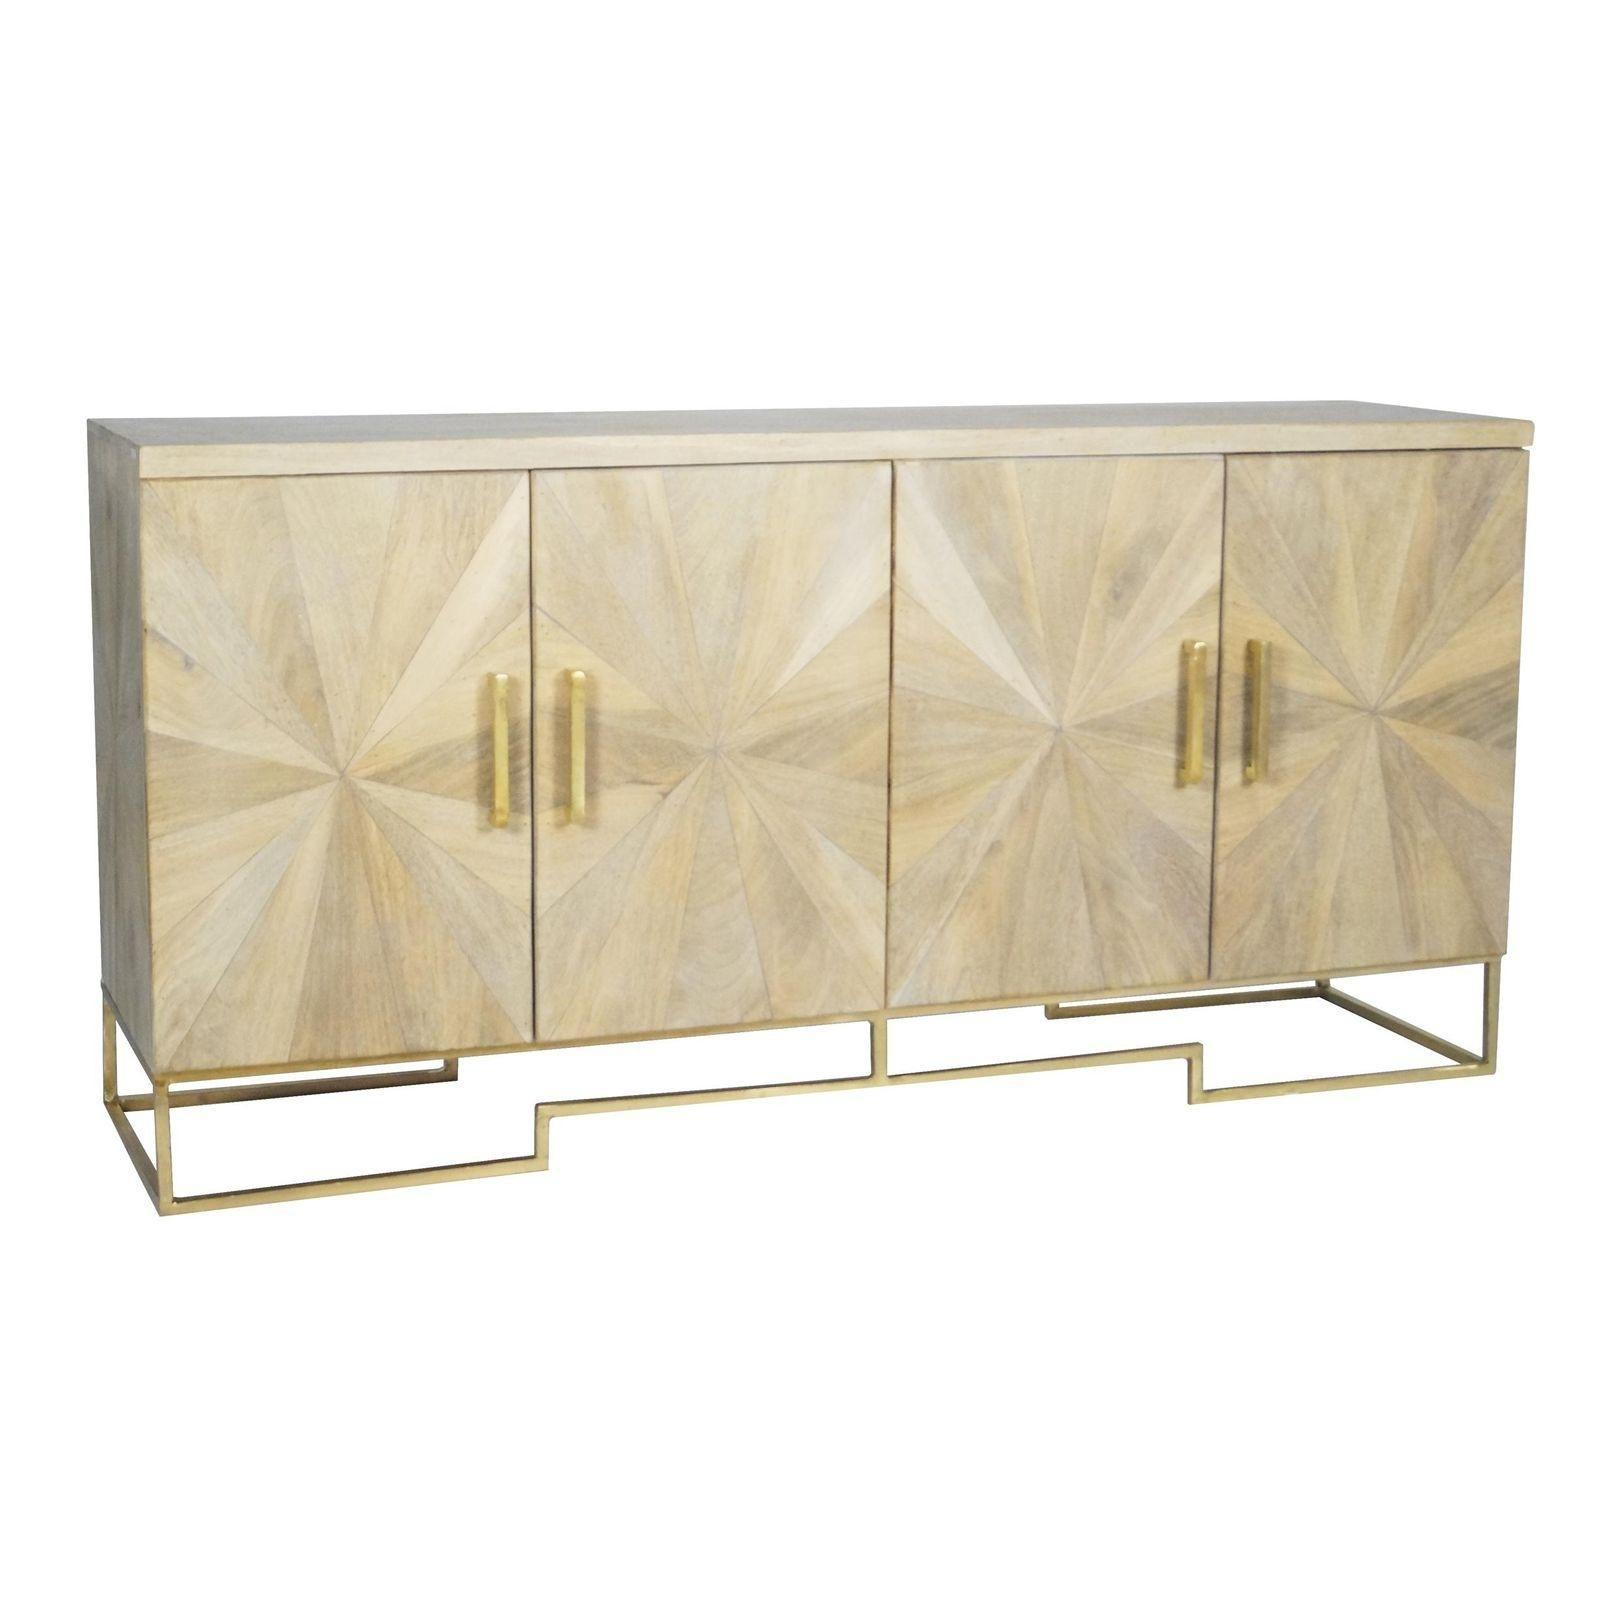 Selamat Designs Justinian Starburst Credenza | Project: Financial For 2018 Starburst 3 Door Sideboards (#12 of 20)